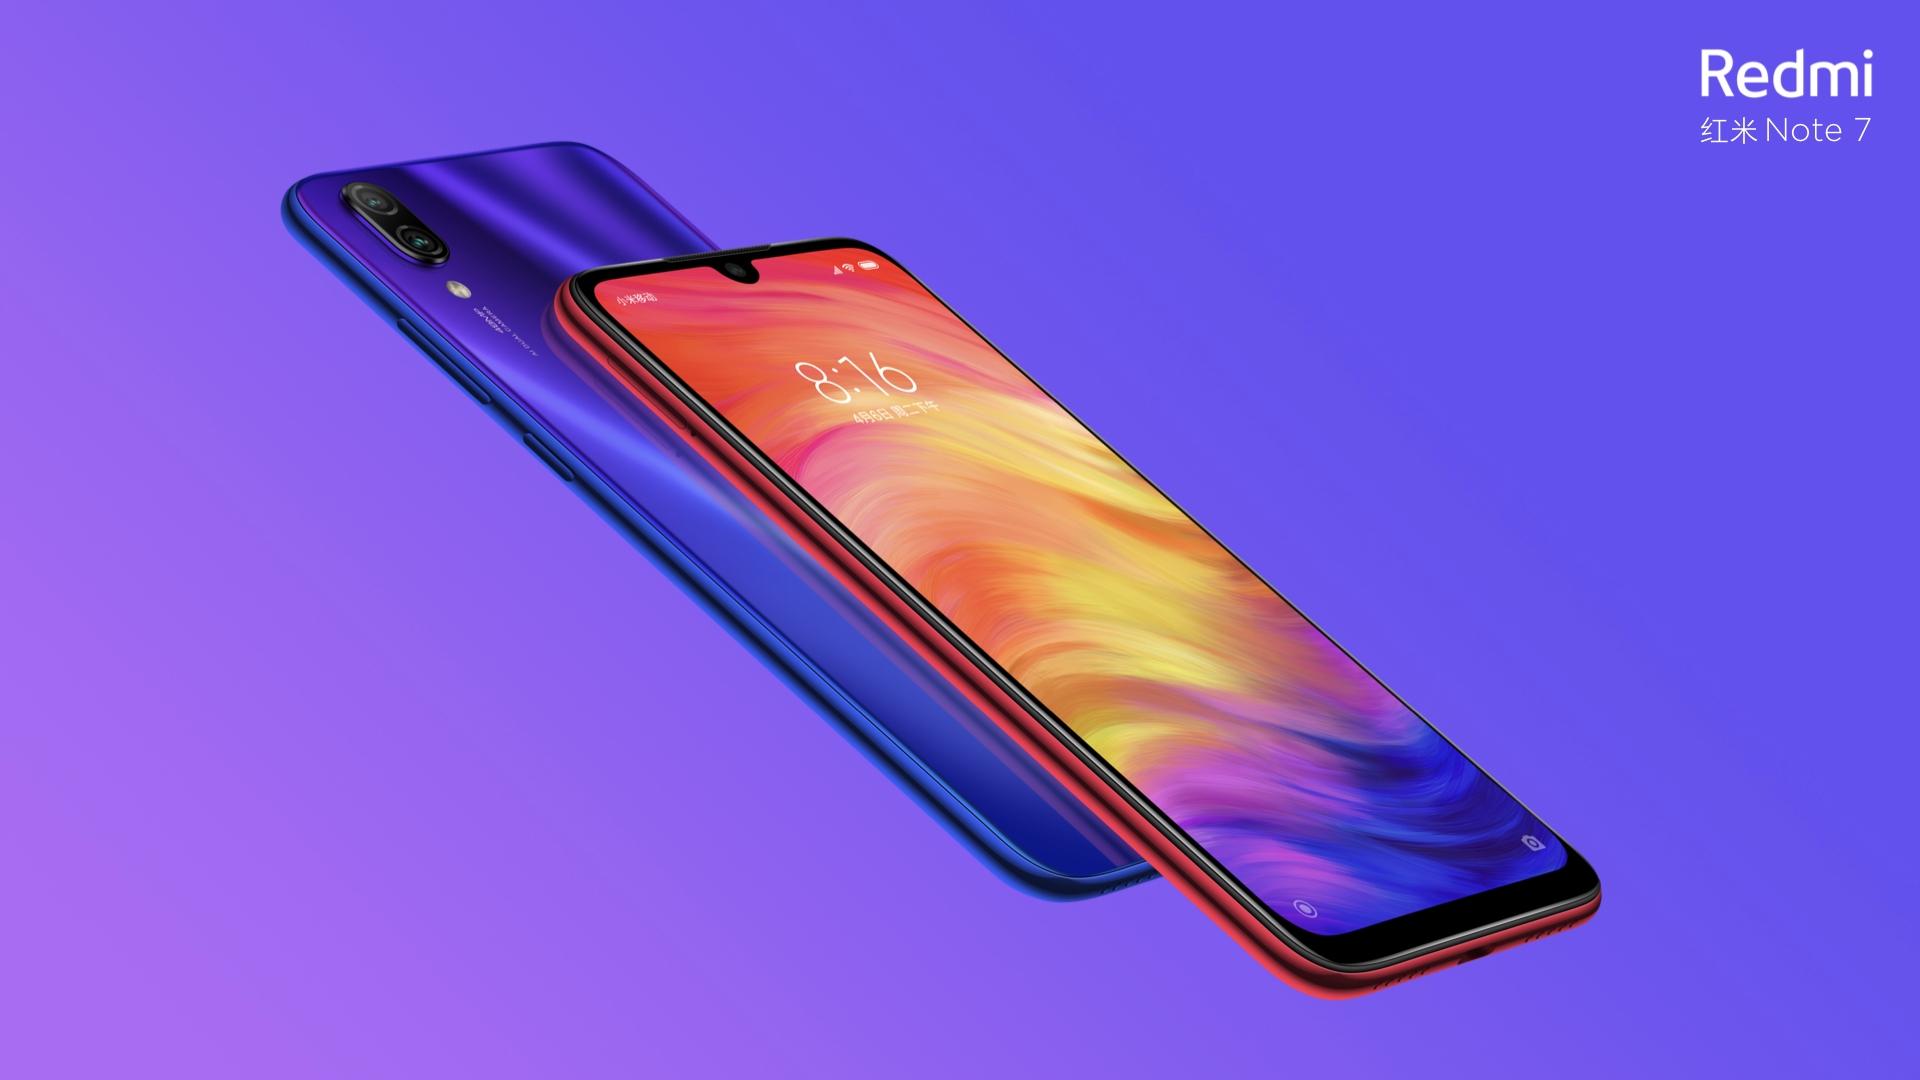 Získejte originální Xiaomi Redmi Note 7 za nižší cenu! [sponzorovaný článek]